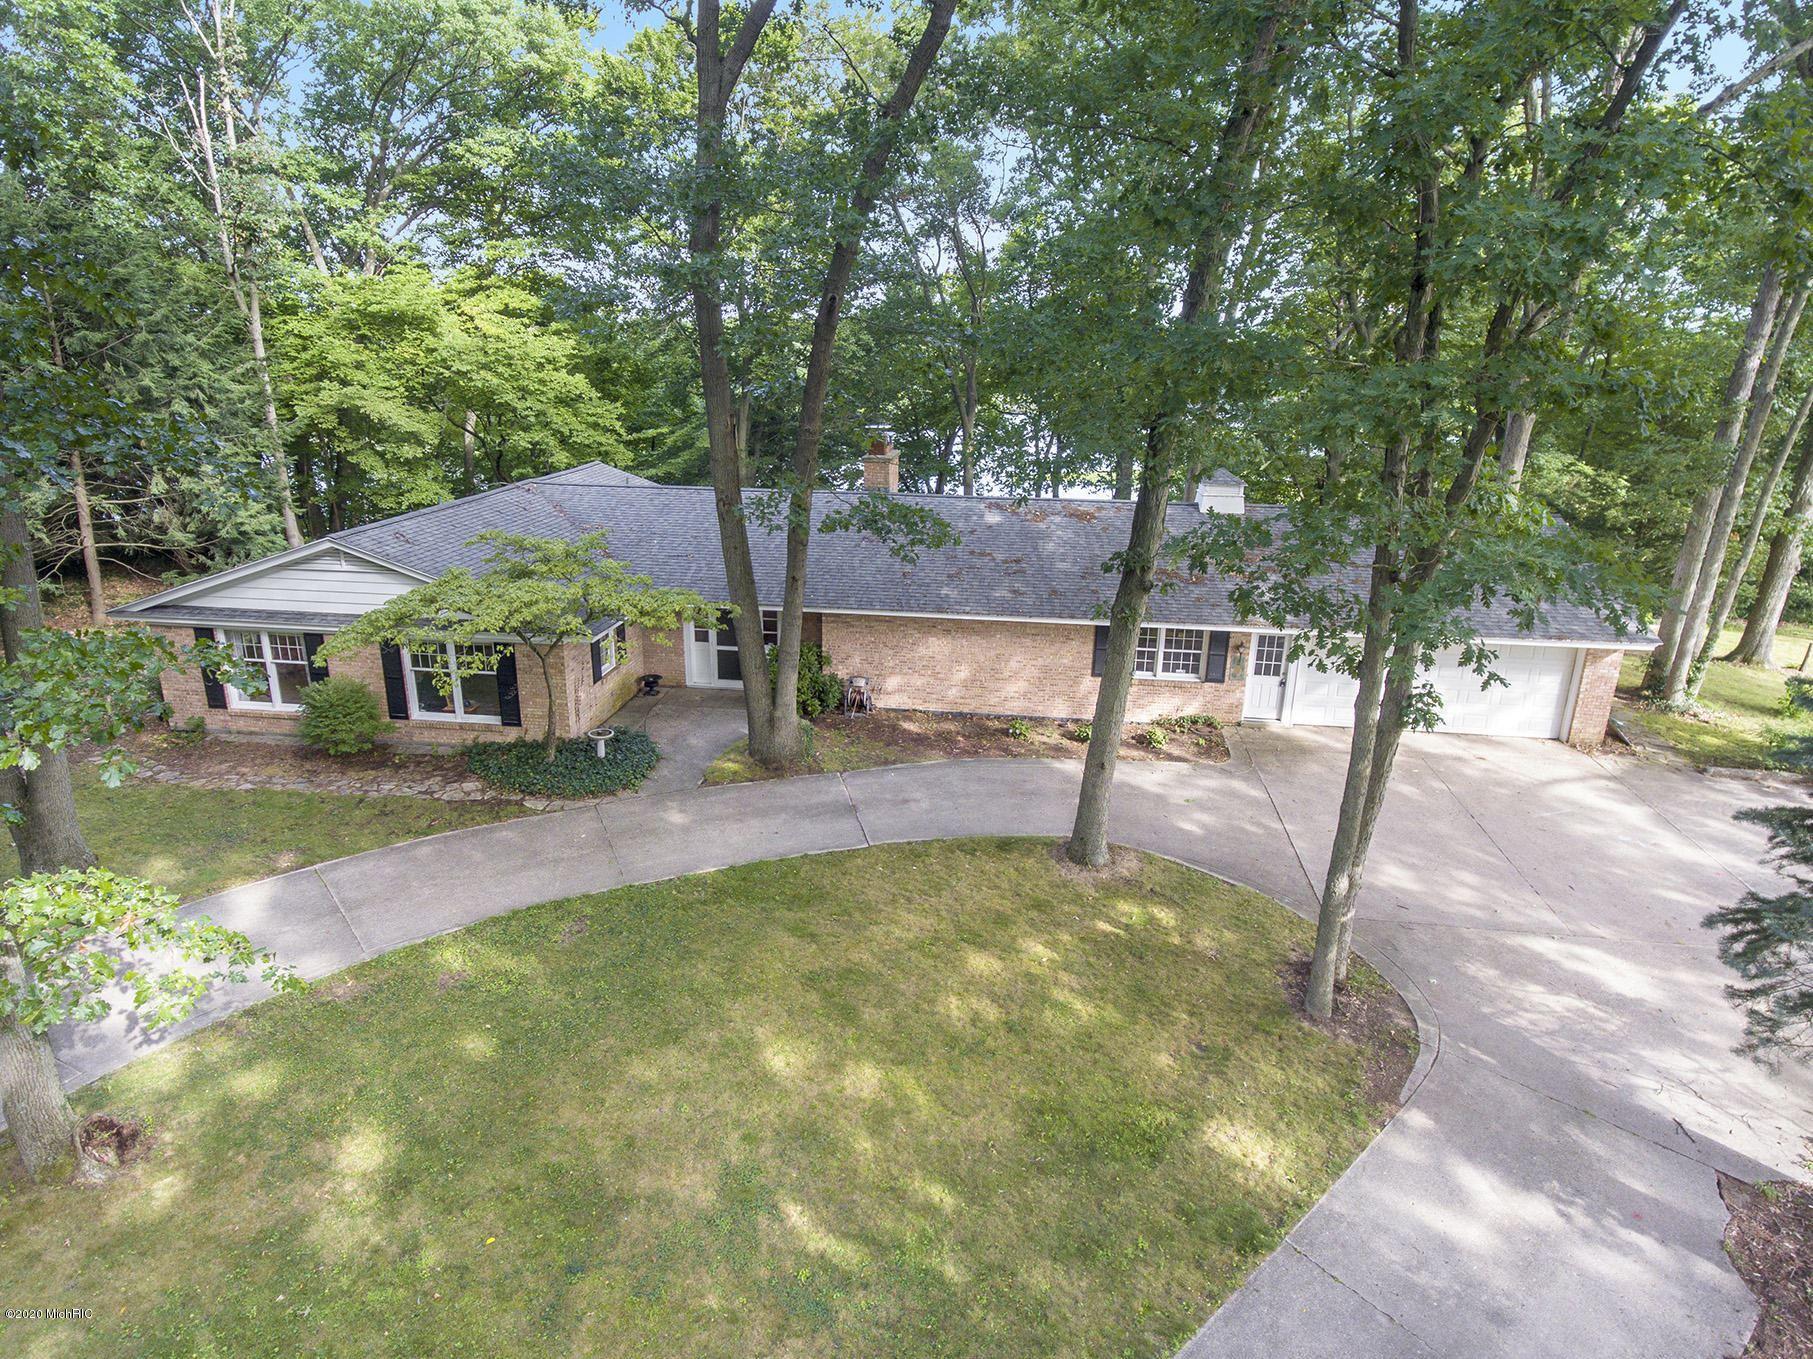 422 Lake Drive, Allegan, MI 49010 - MLS#: 20030397